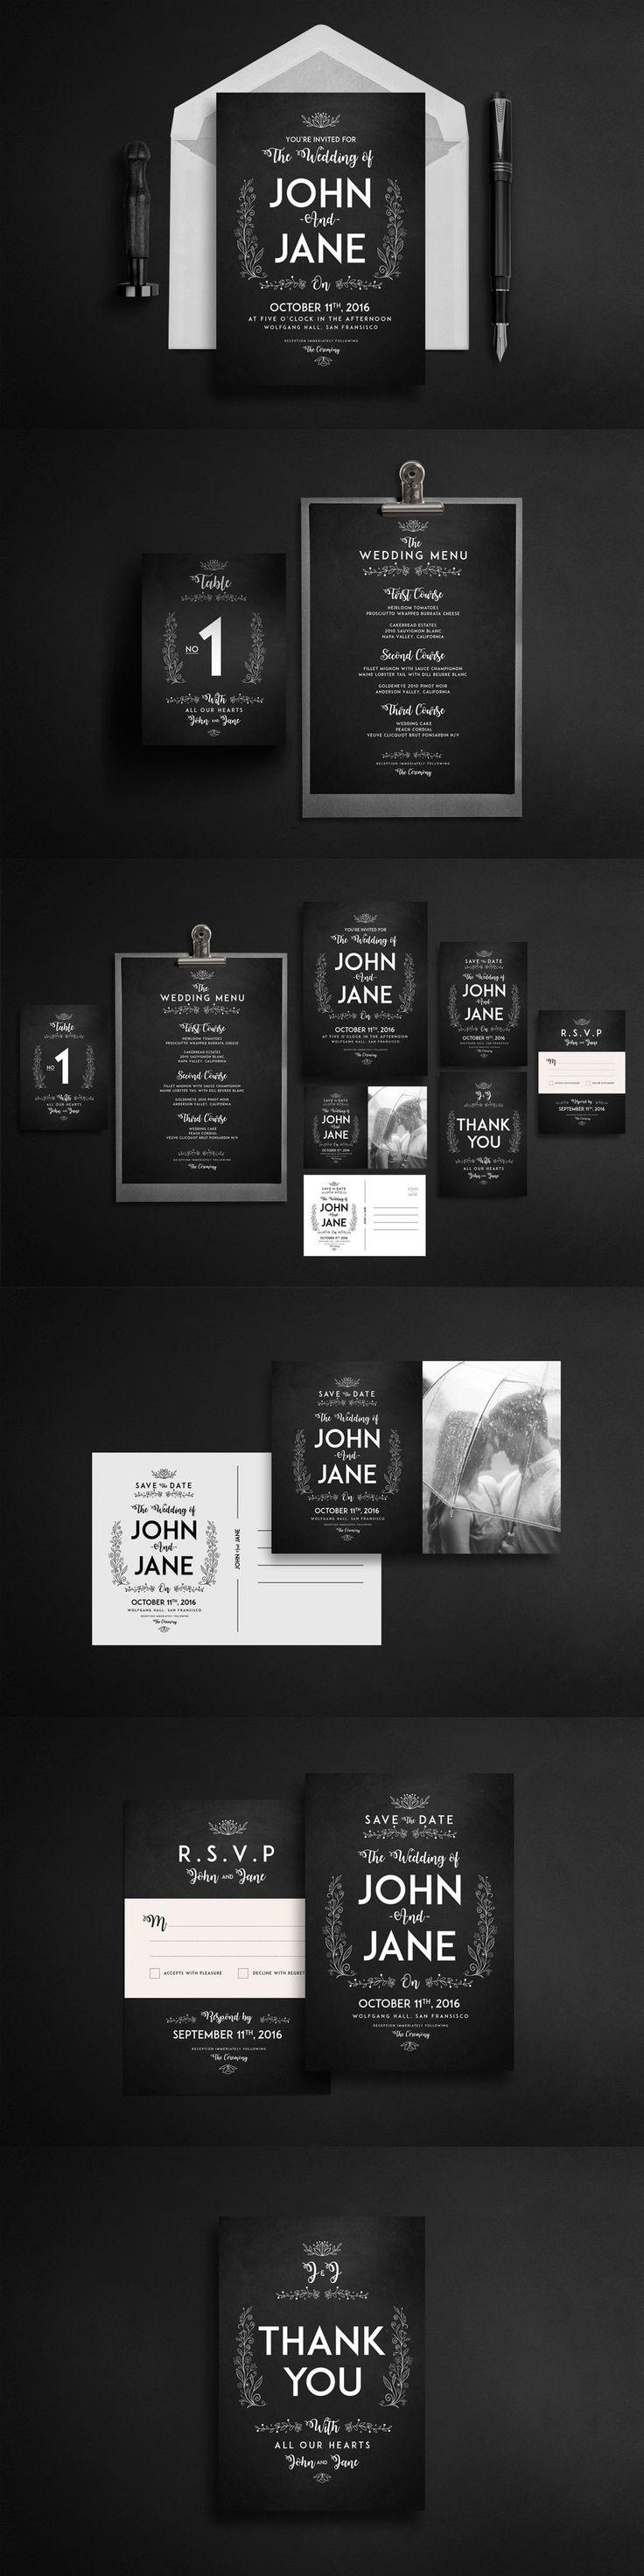 Best 121 Wedding Invitation Card Templates ideas on Pinterest